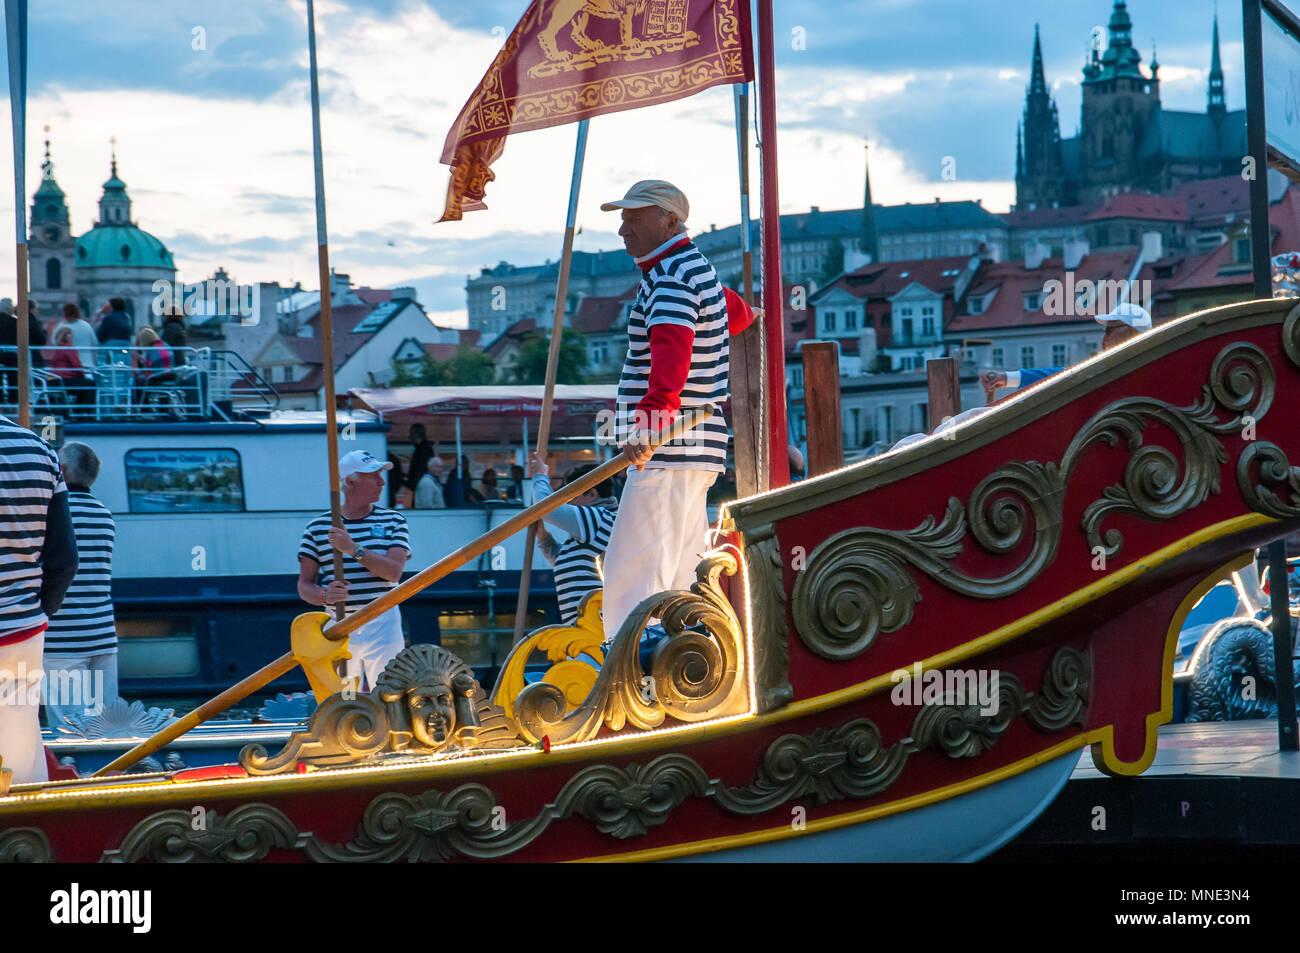 Navalis Stock Photos & Navalis Stock Images - Alamy